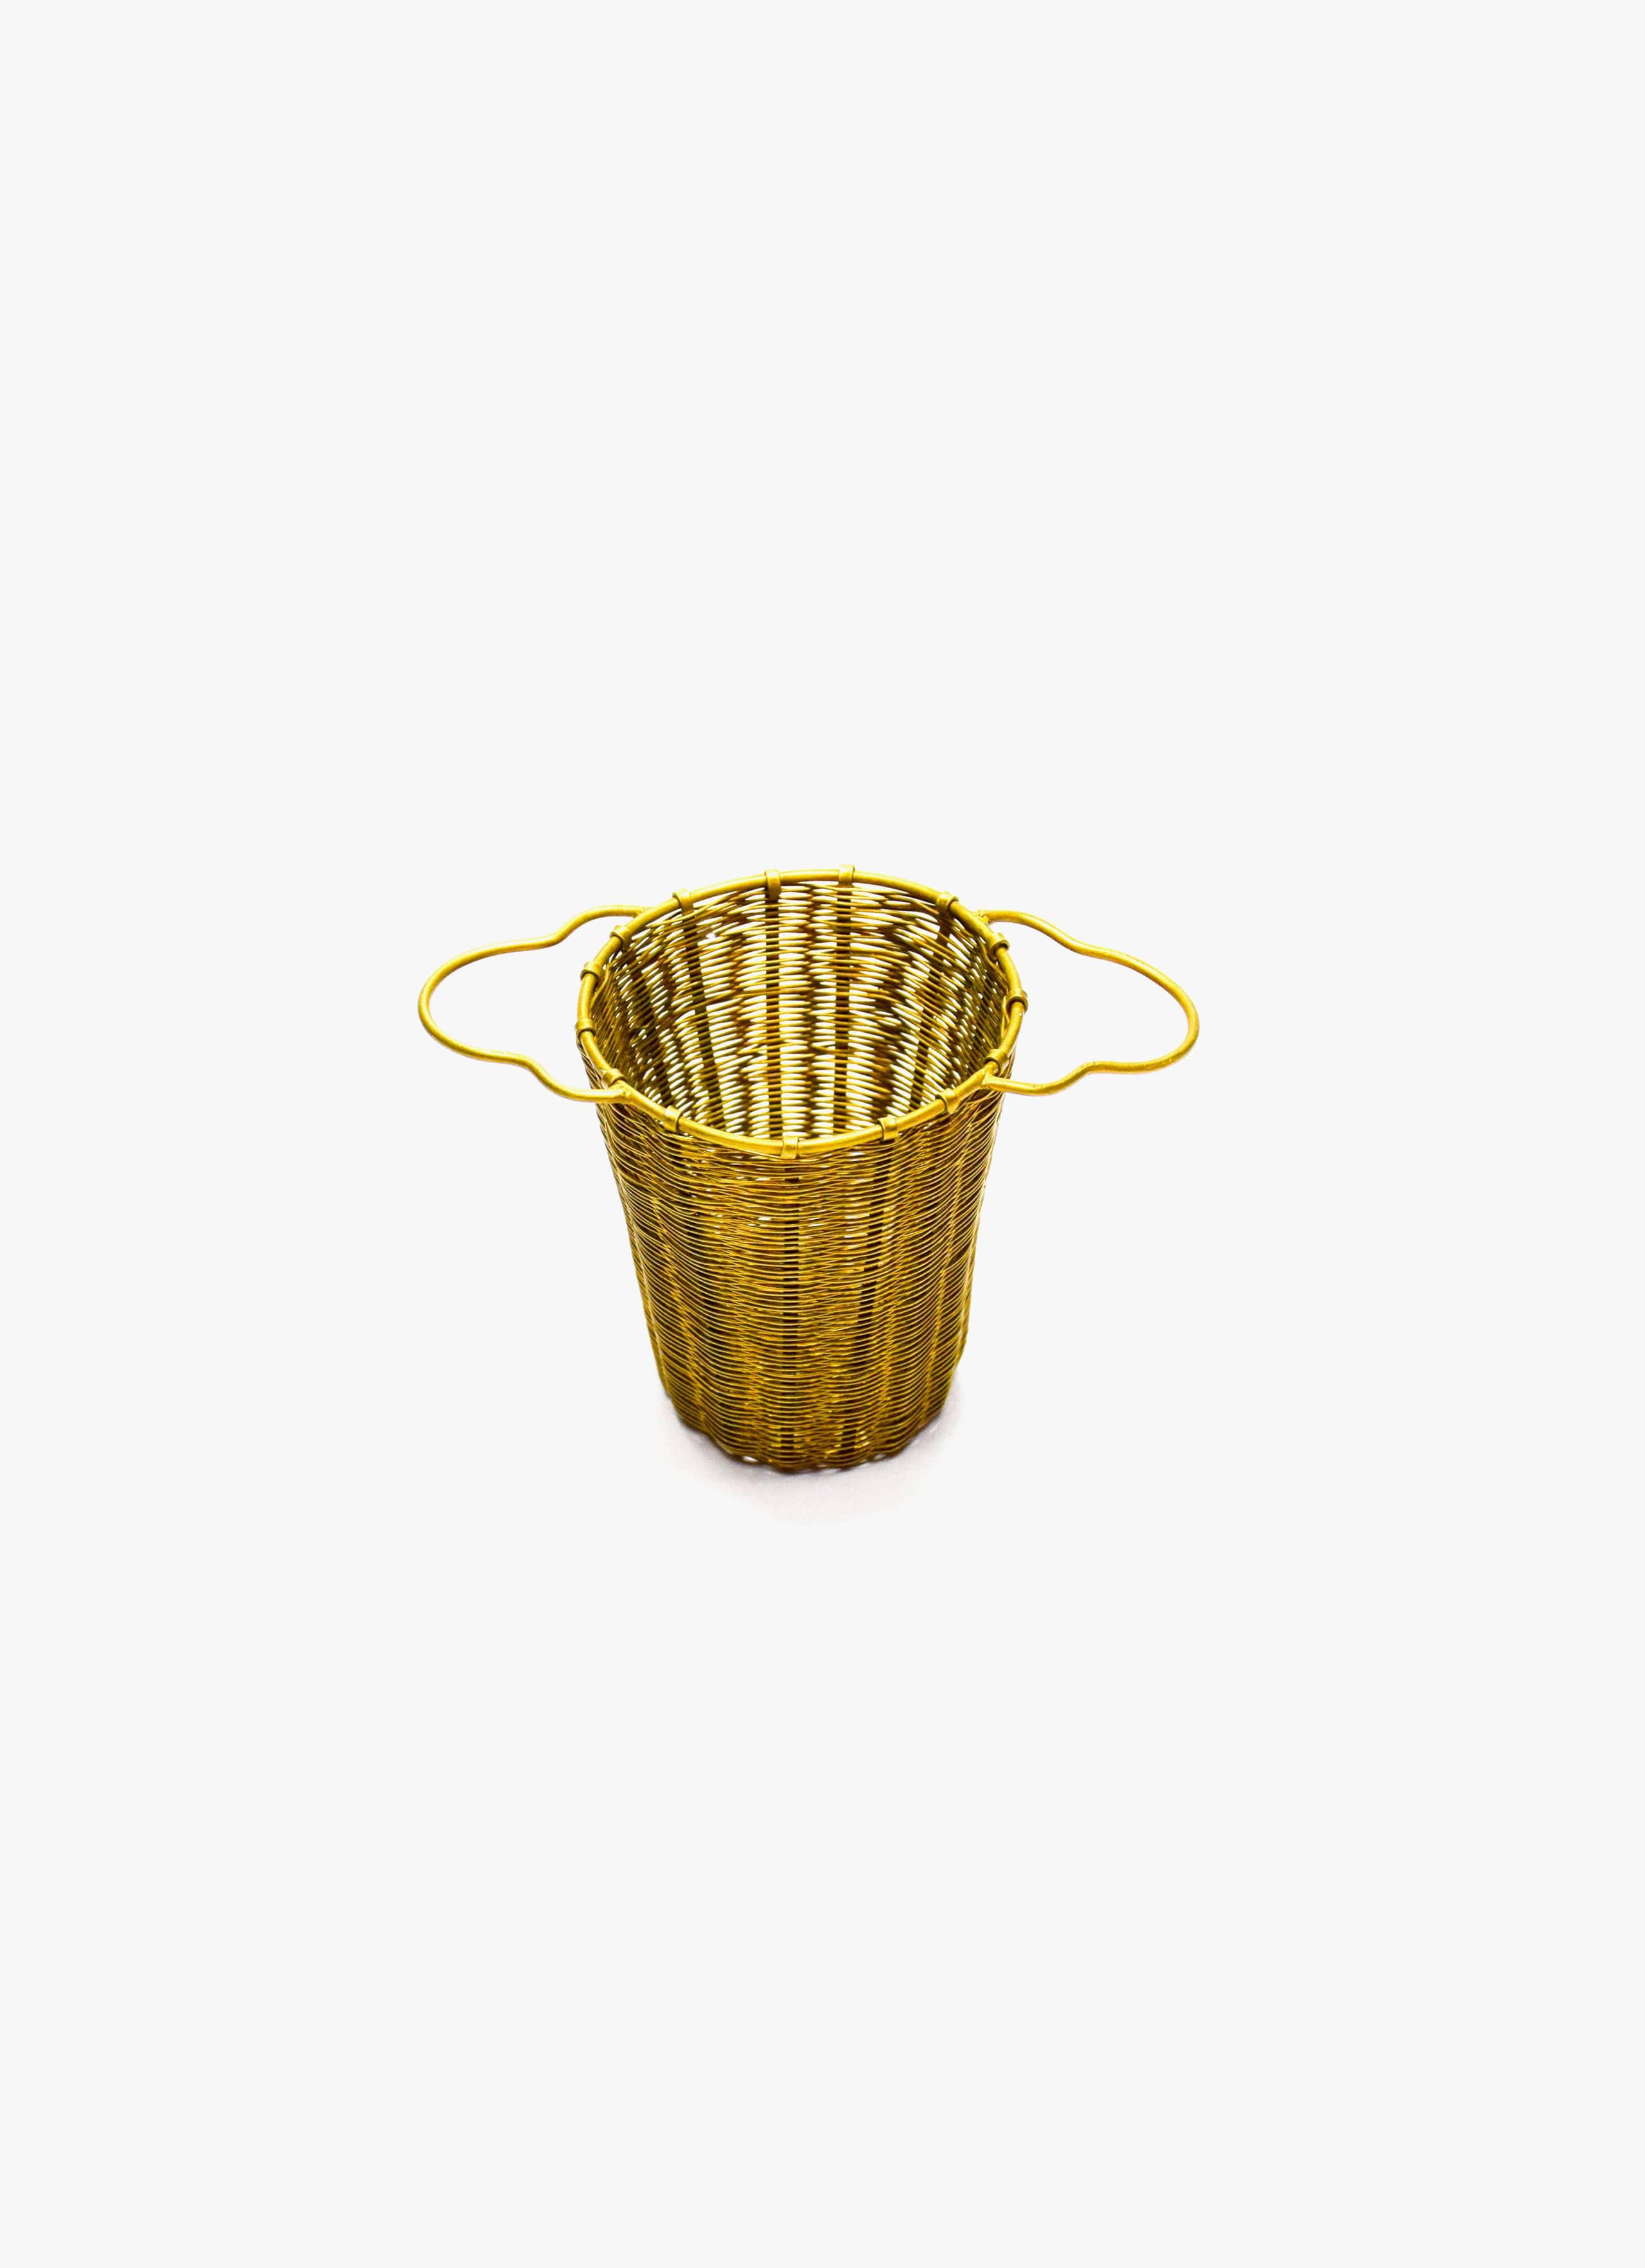 Bellocq - Tea Strainer - Deep Basket - Brass